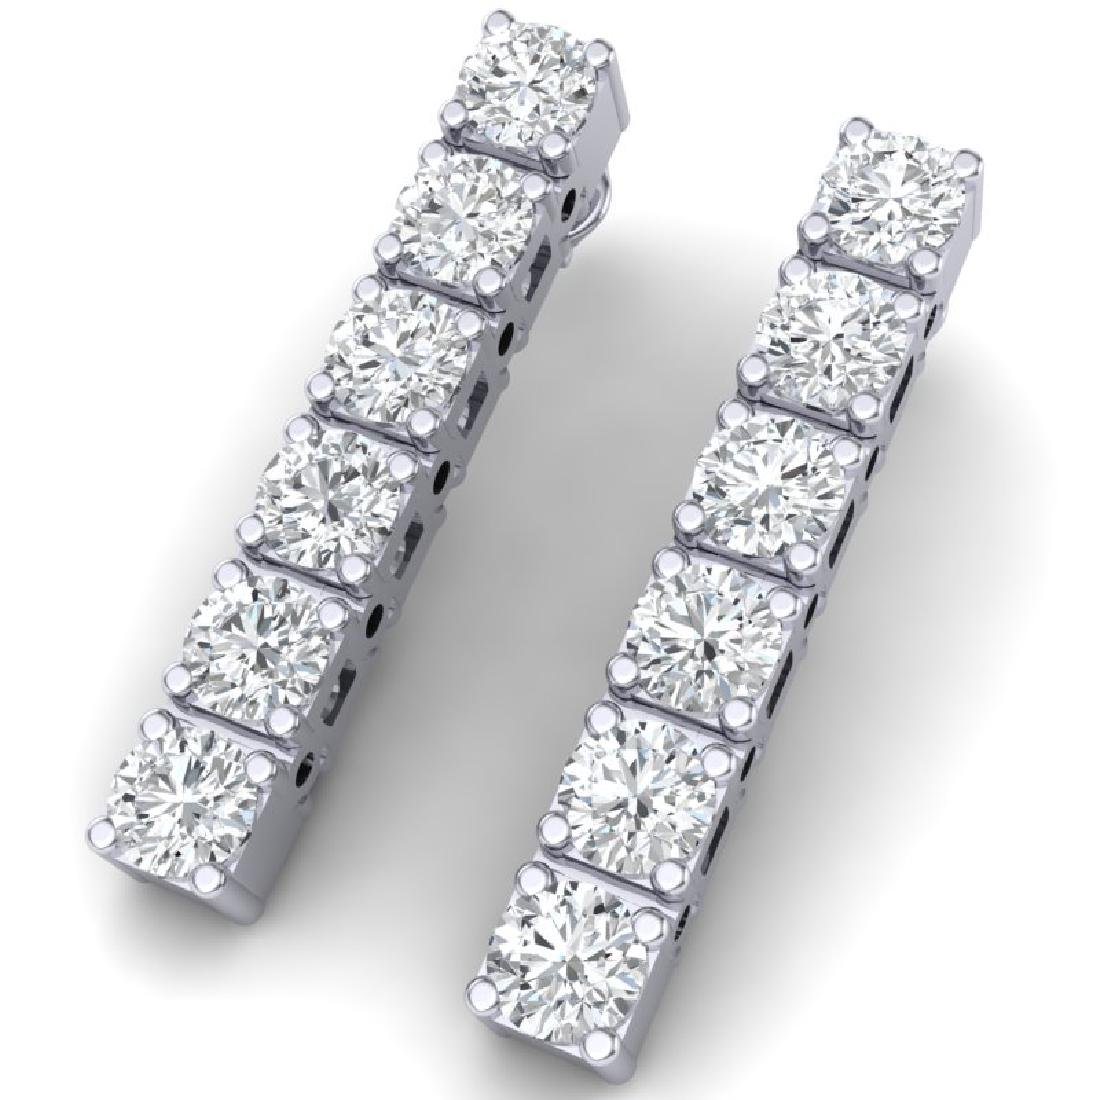 6 CTW Certified SI Diamond Earrings 18K White Gold